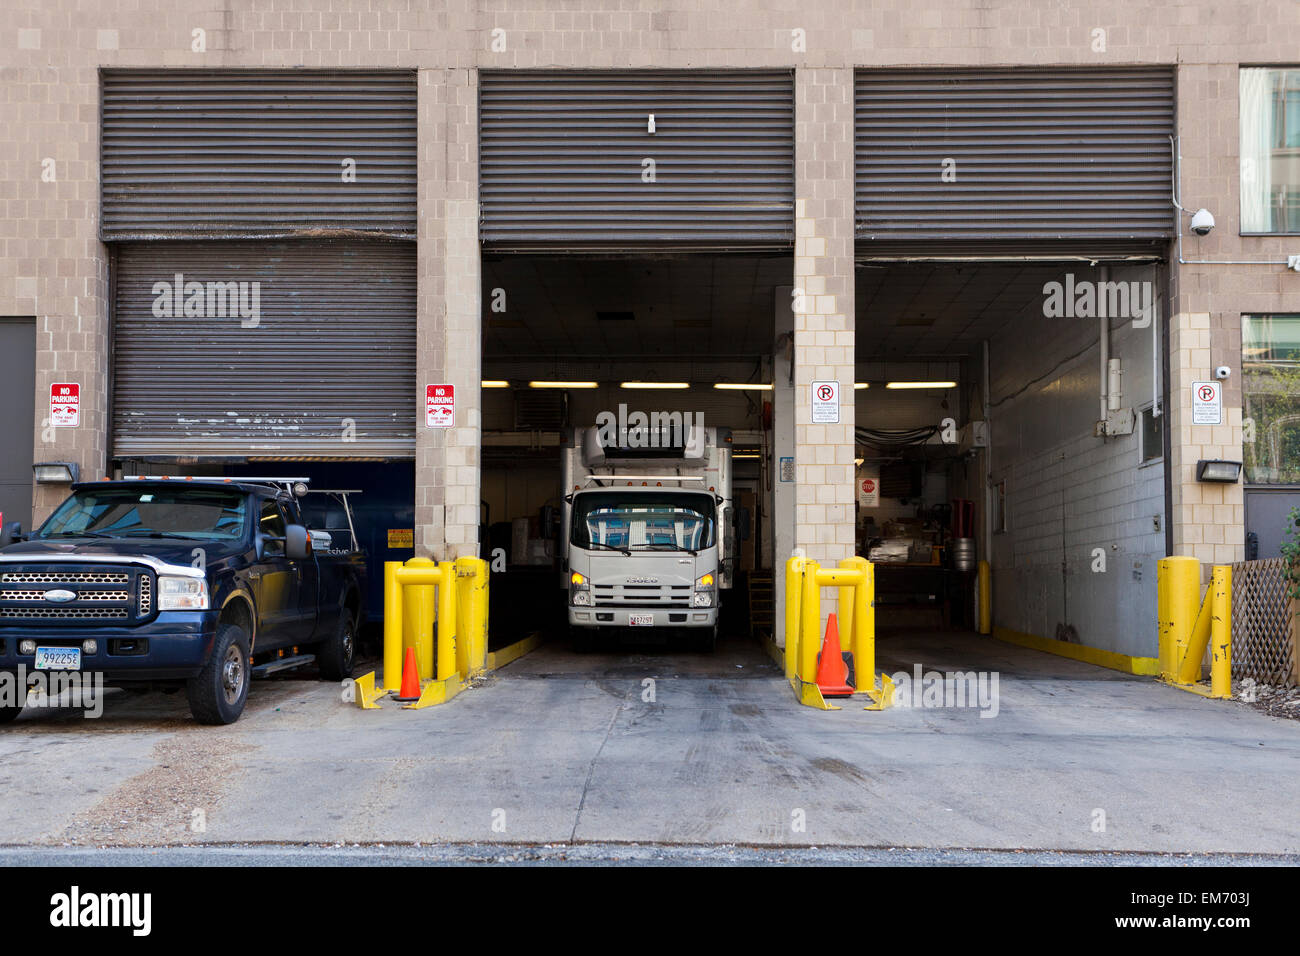 Loading dock of building - USA - Stock Image